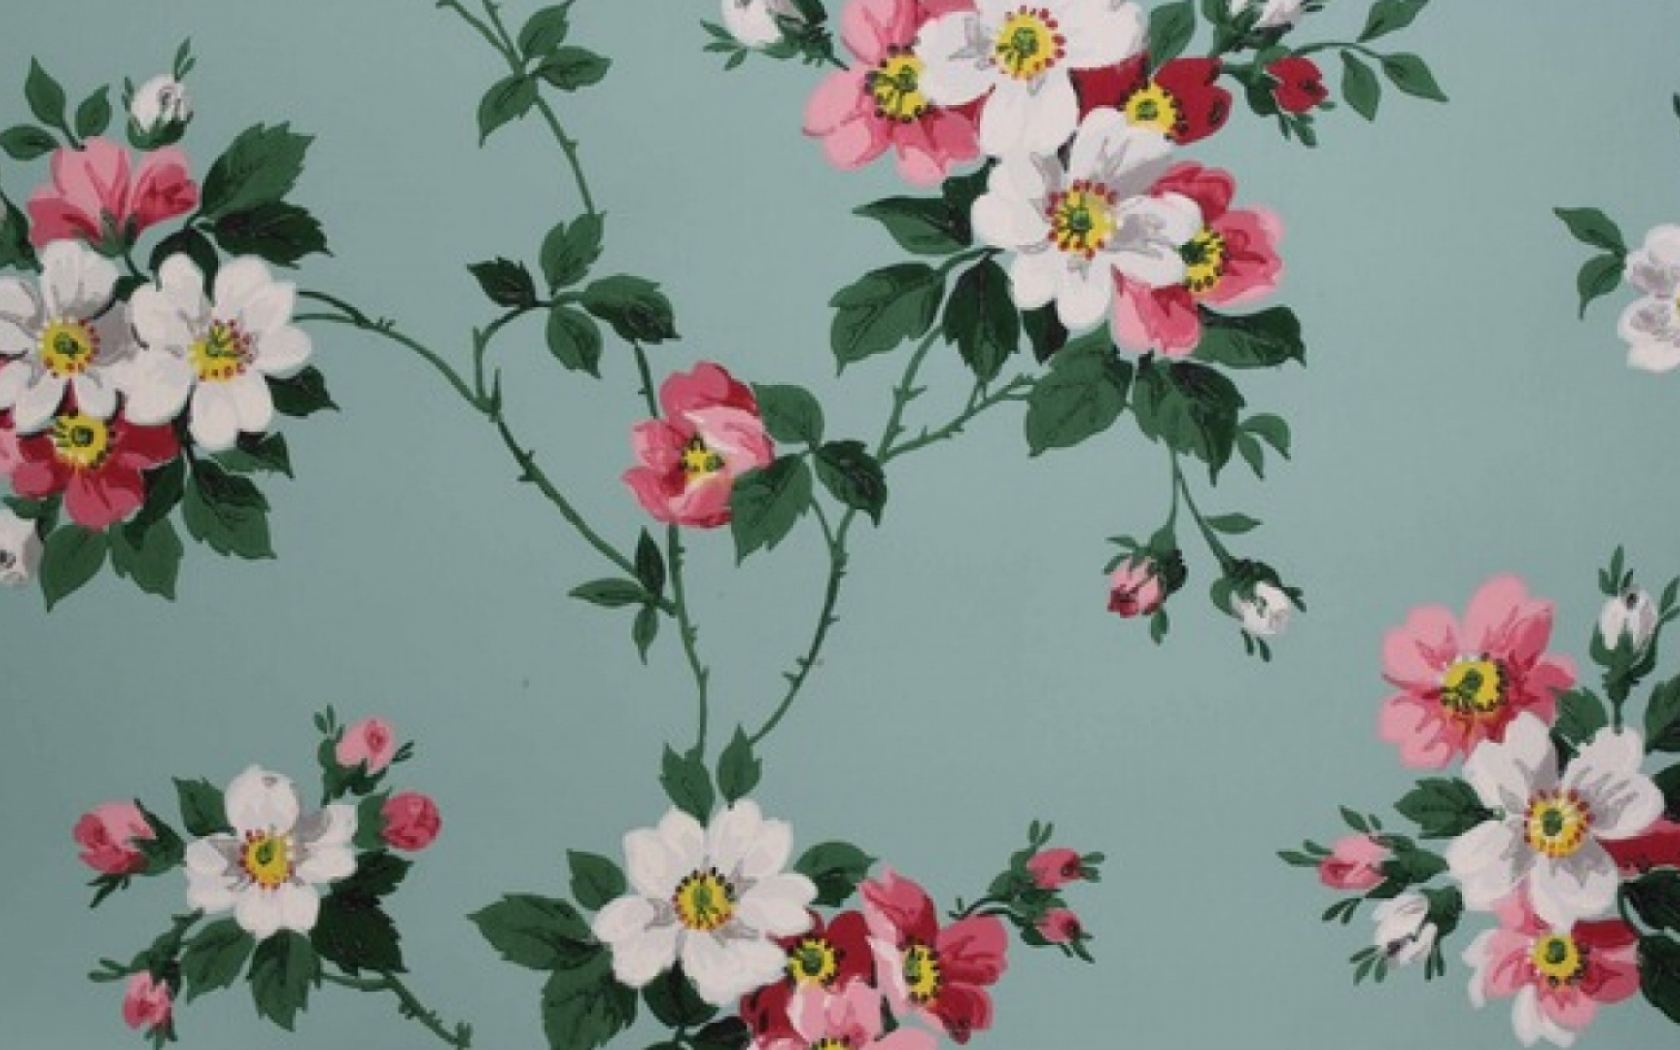 Free Download Vintage Flower Wallpaper Hd Desktop Wallpapers